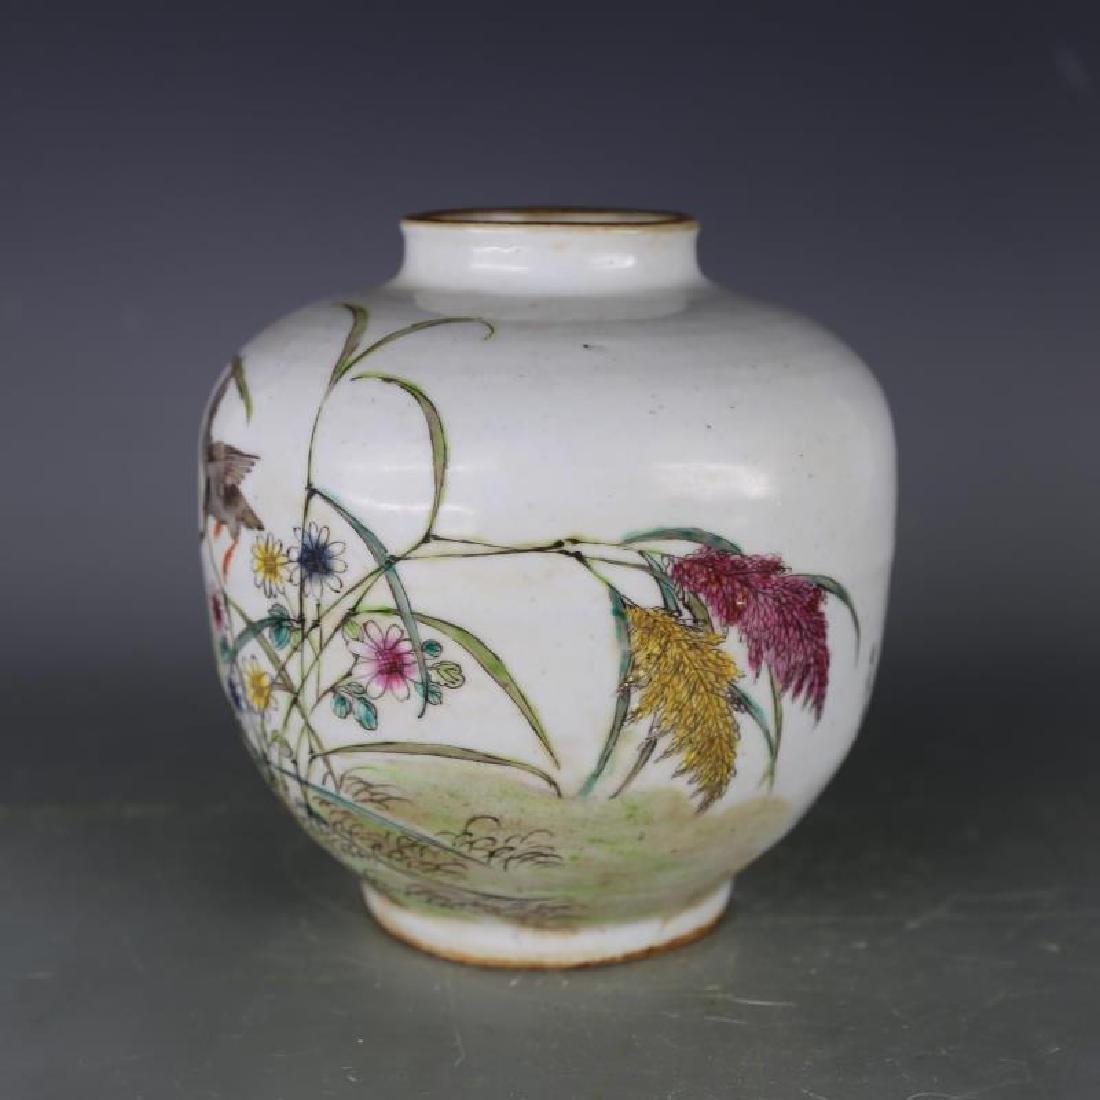 Chinese Qing Dynasty Famille-Rose Porcelain Jar - 2